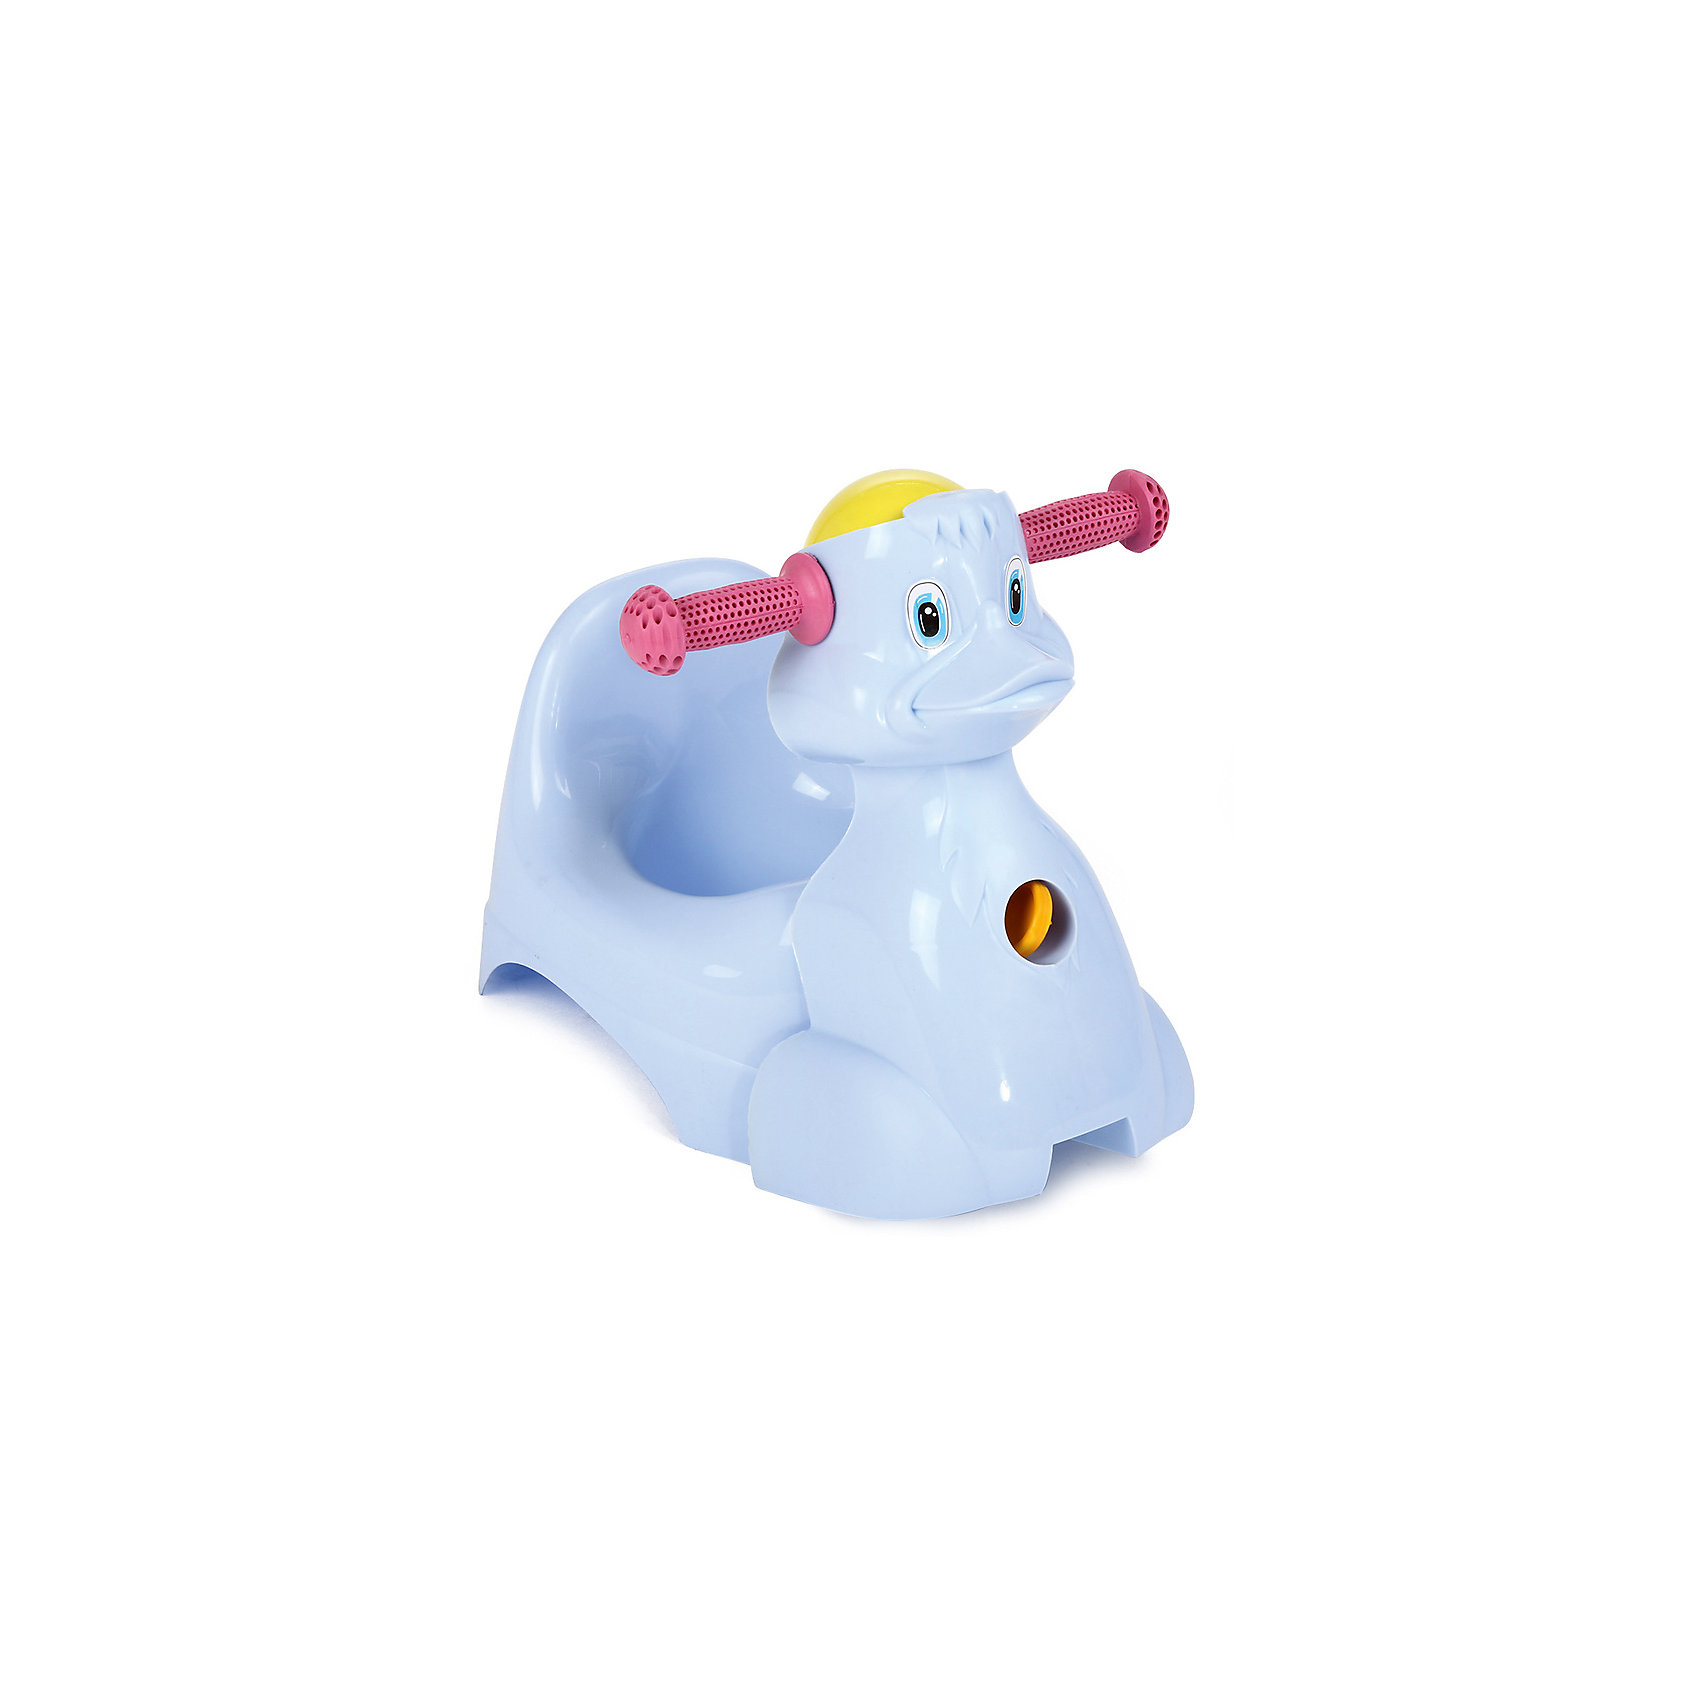 Горшок-игрушка Уточка, Little Angel, голубой (Пластик)